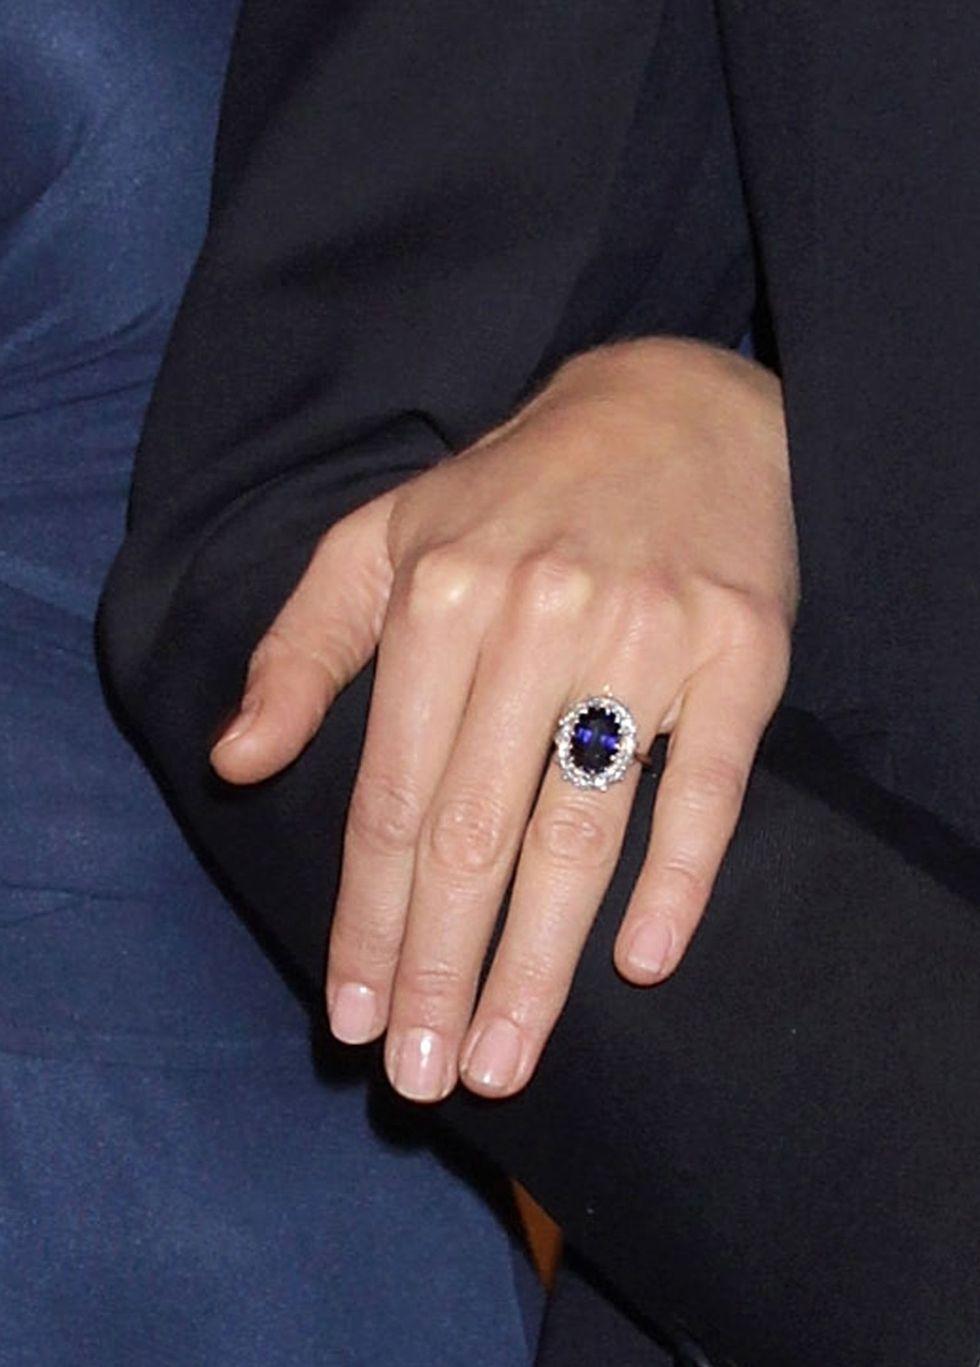 kate middleton engagement ring | Kate middleton engagement ...